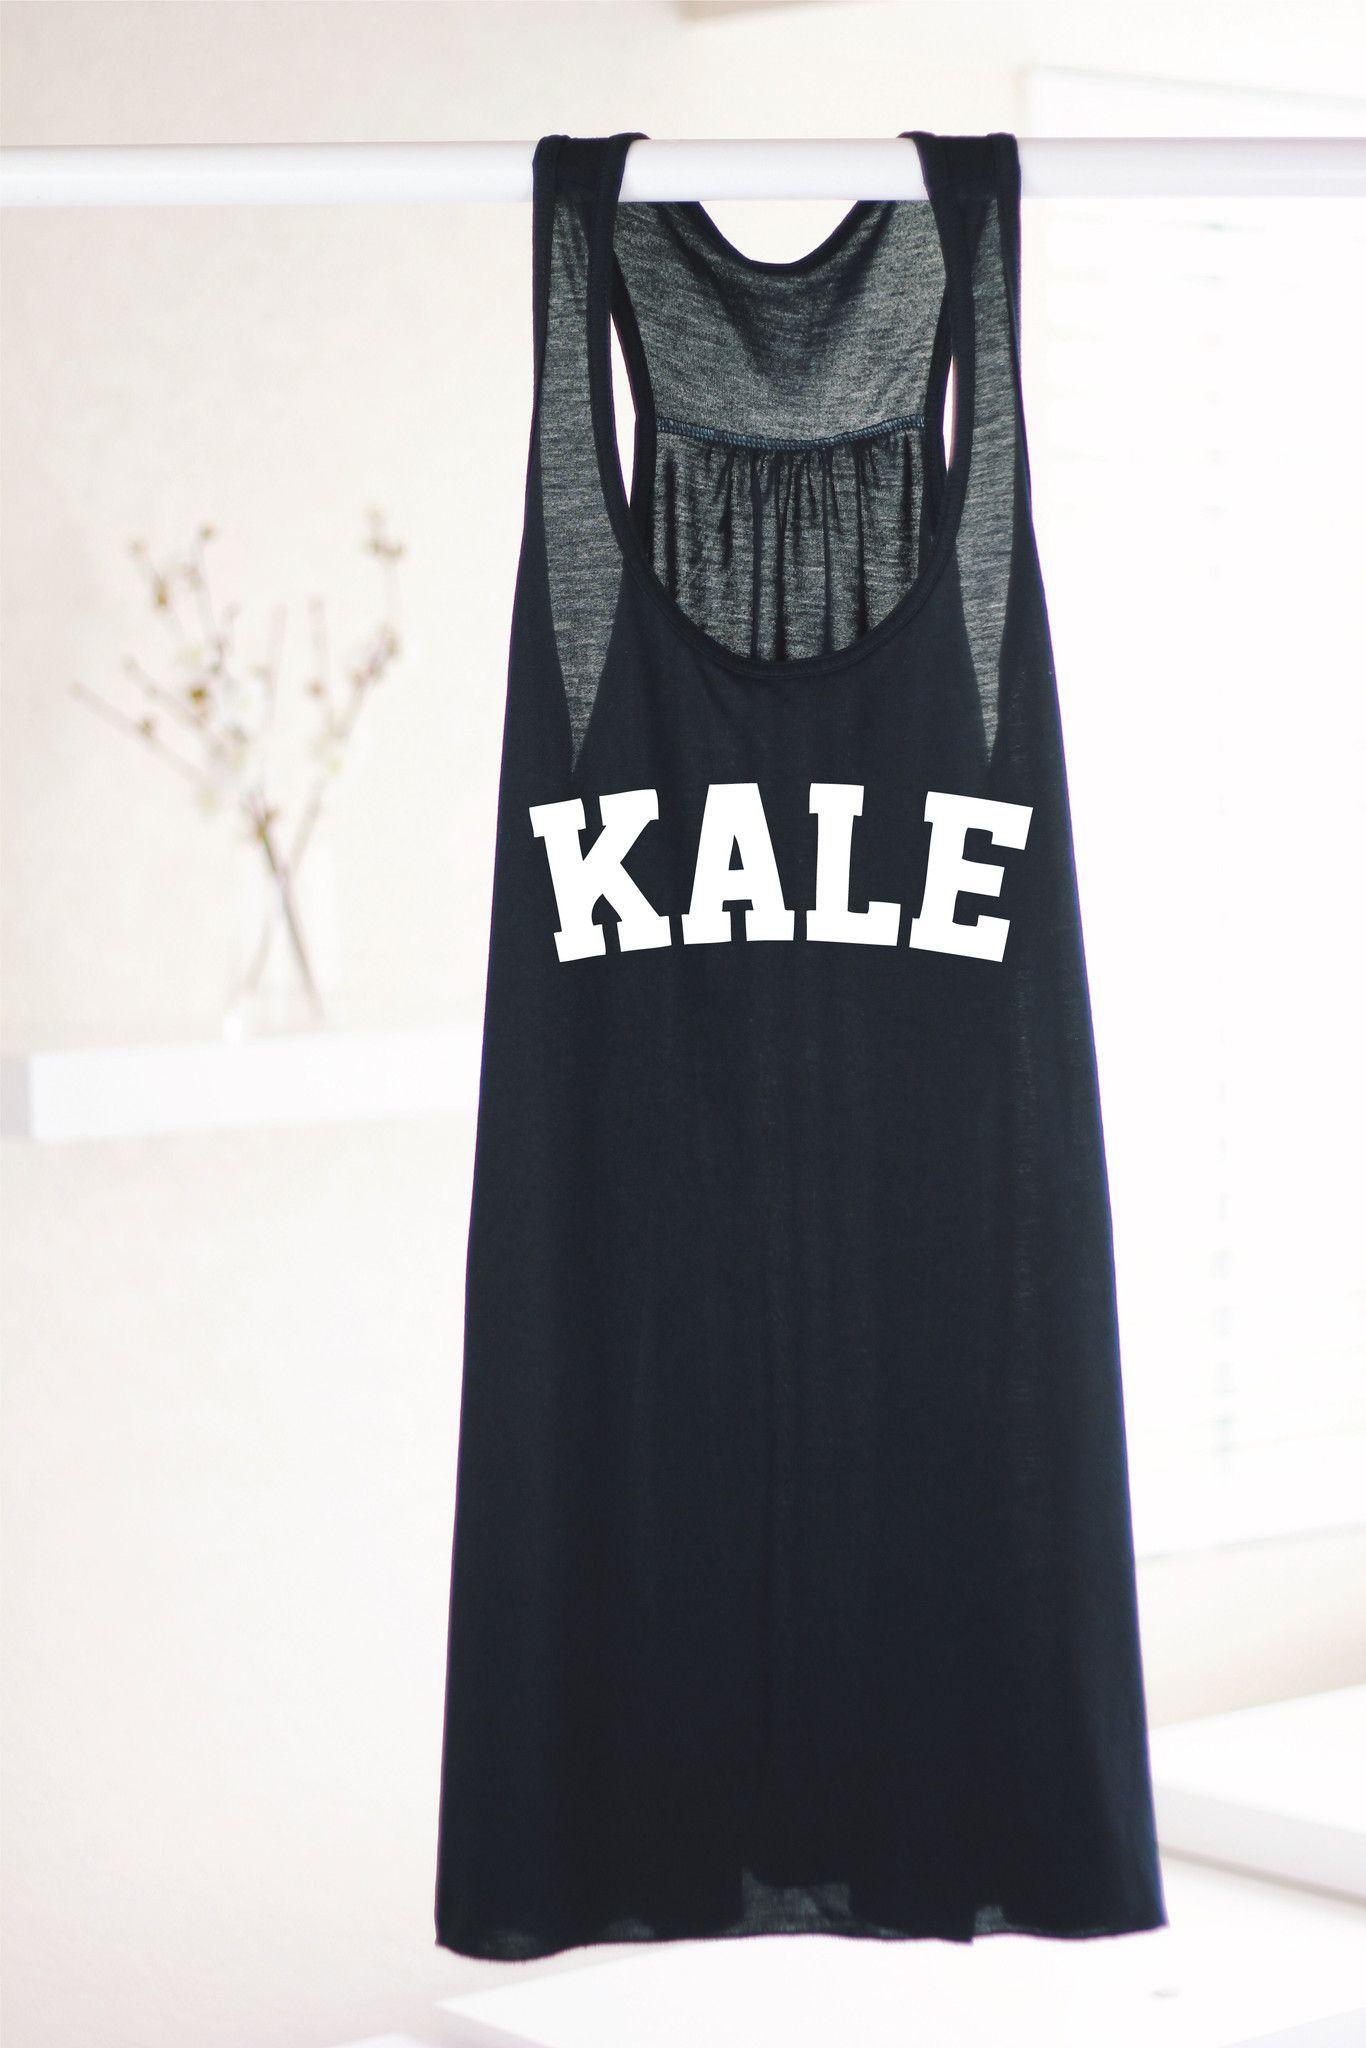 KALE TANK - BLACK RACERBACK